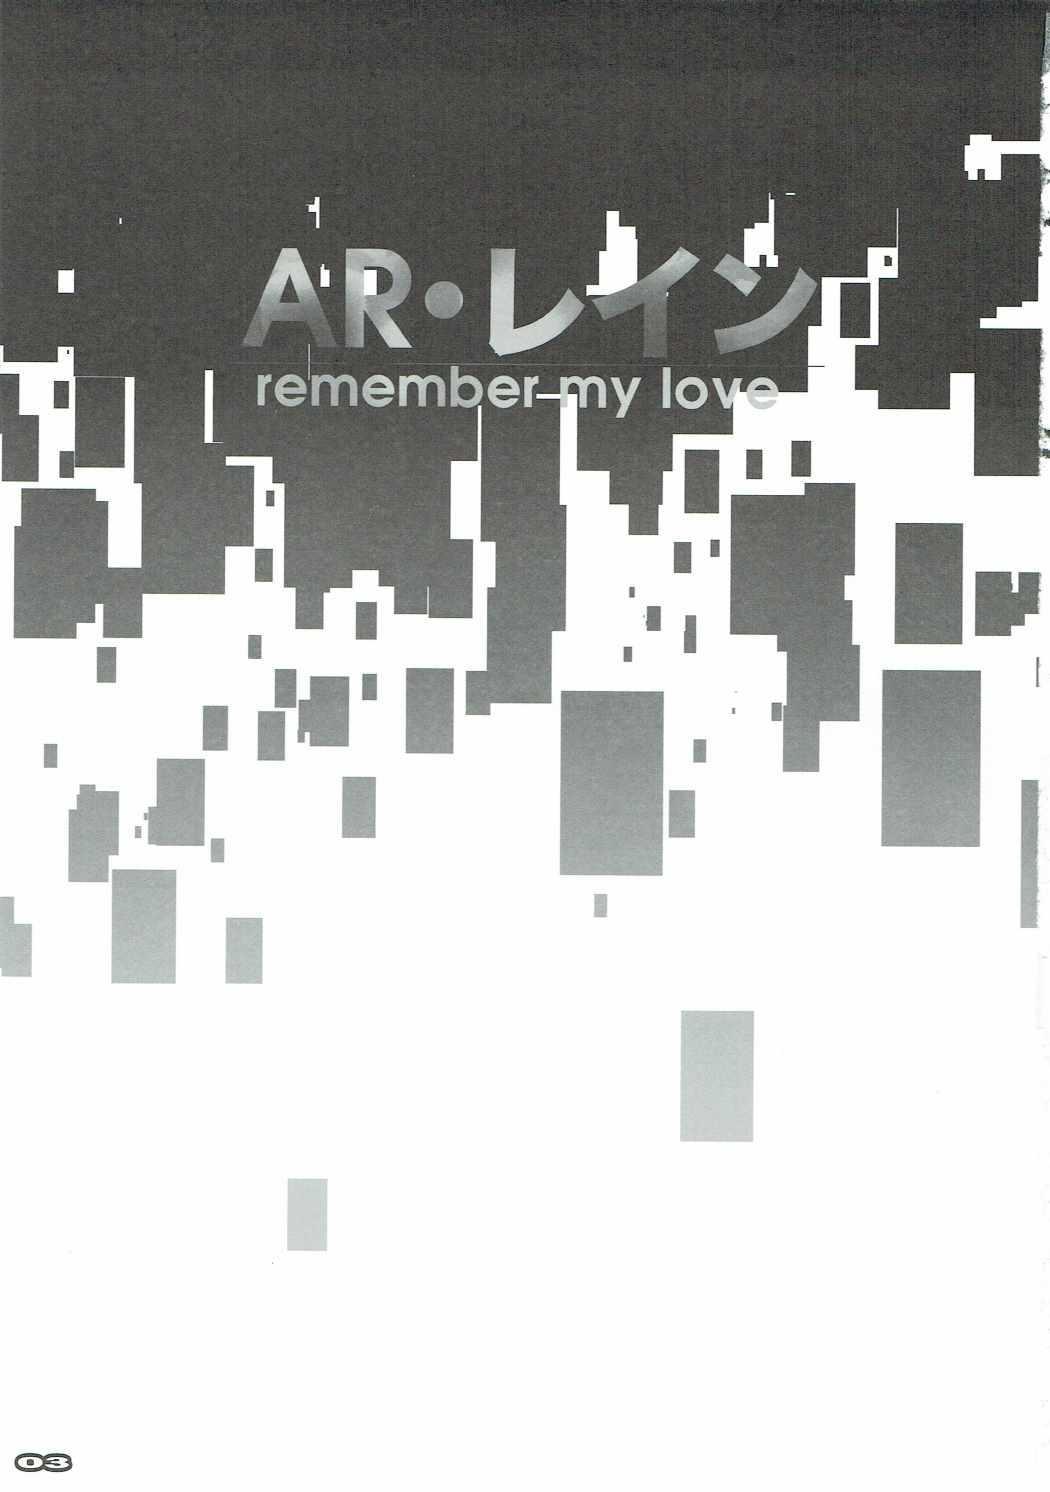 AR Rain - Remember My Love 1